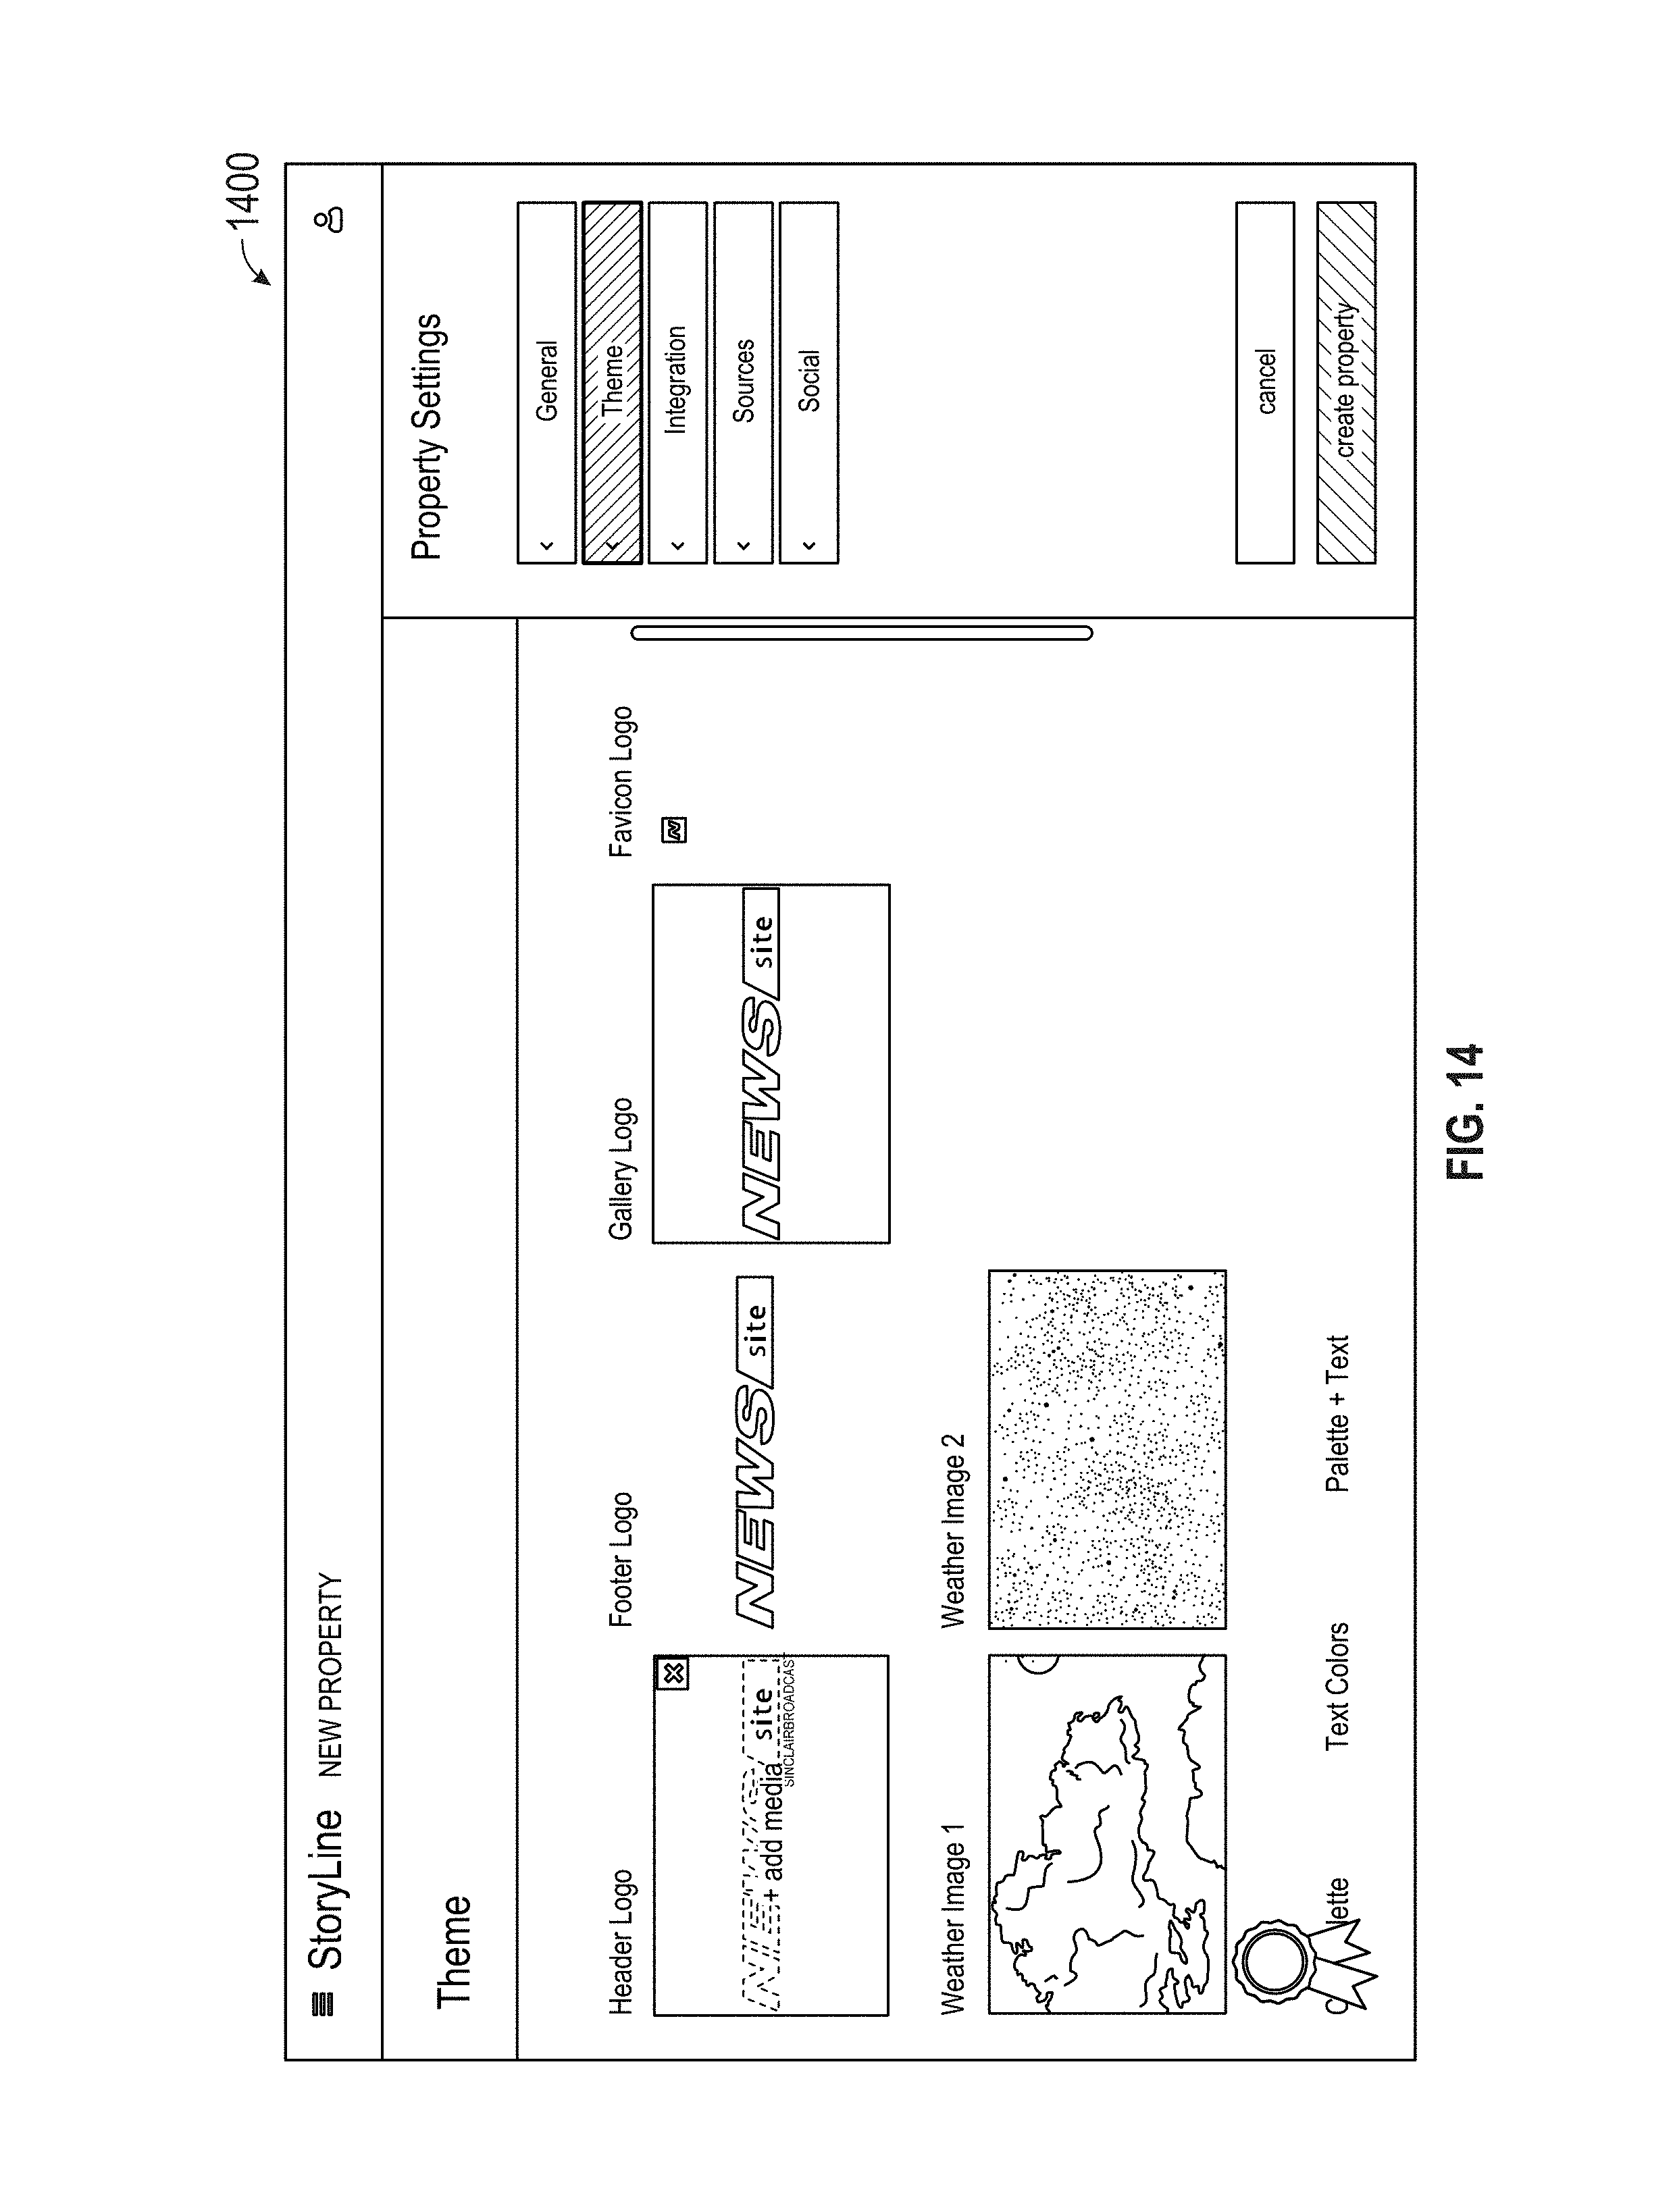 Patent US 10,068,568 B2